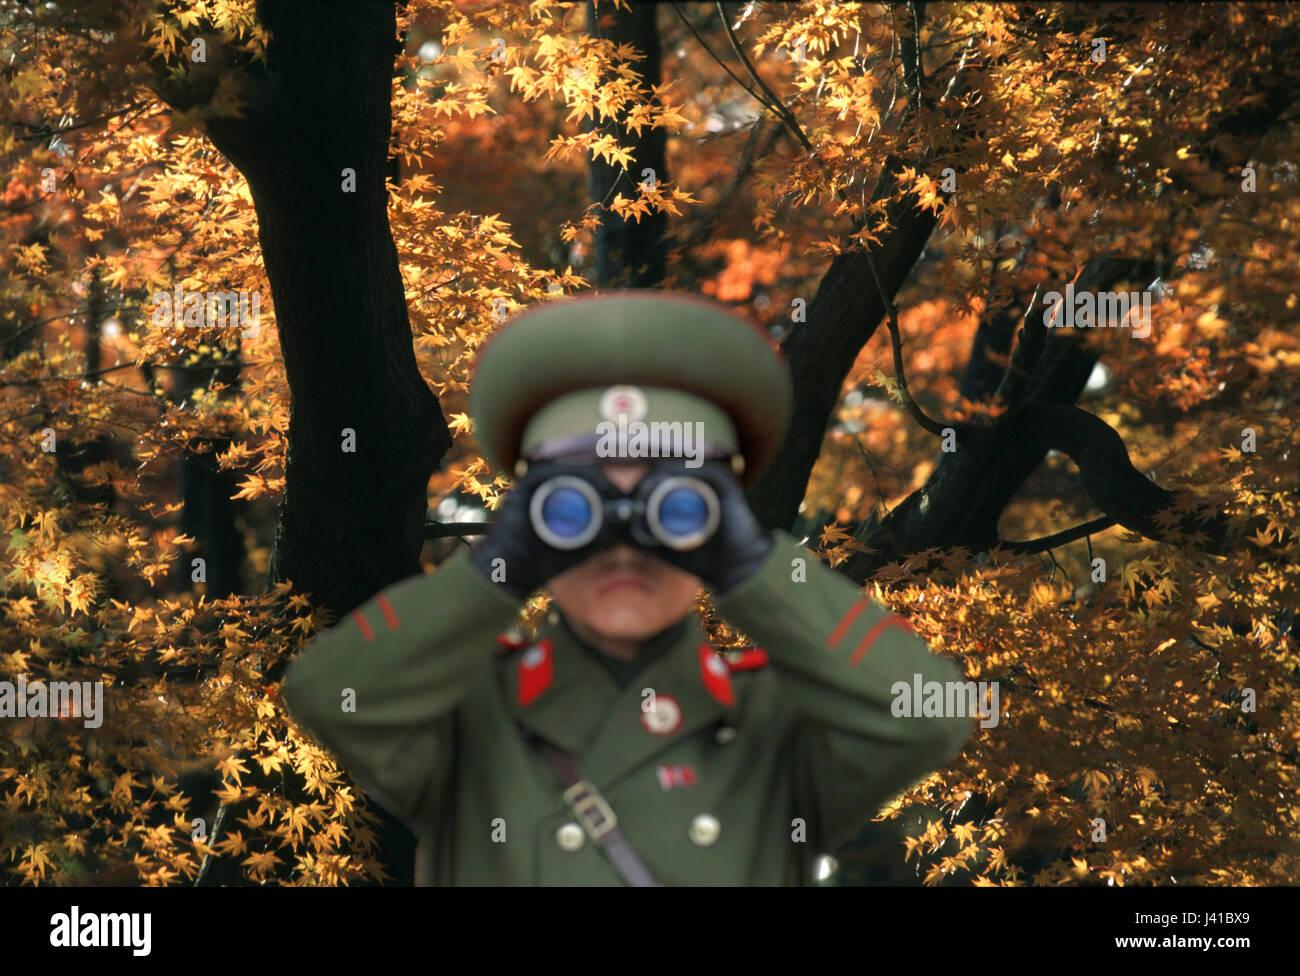 Soldier looking through binoculars, Military, Autumnal tree in the background, Kumgangsan, North Korea, Asia - Stock Image